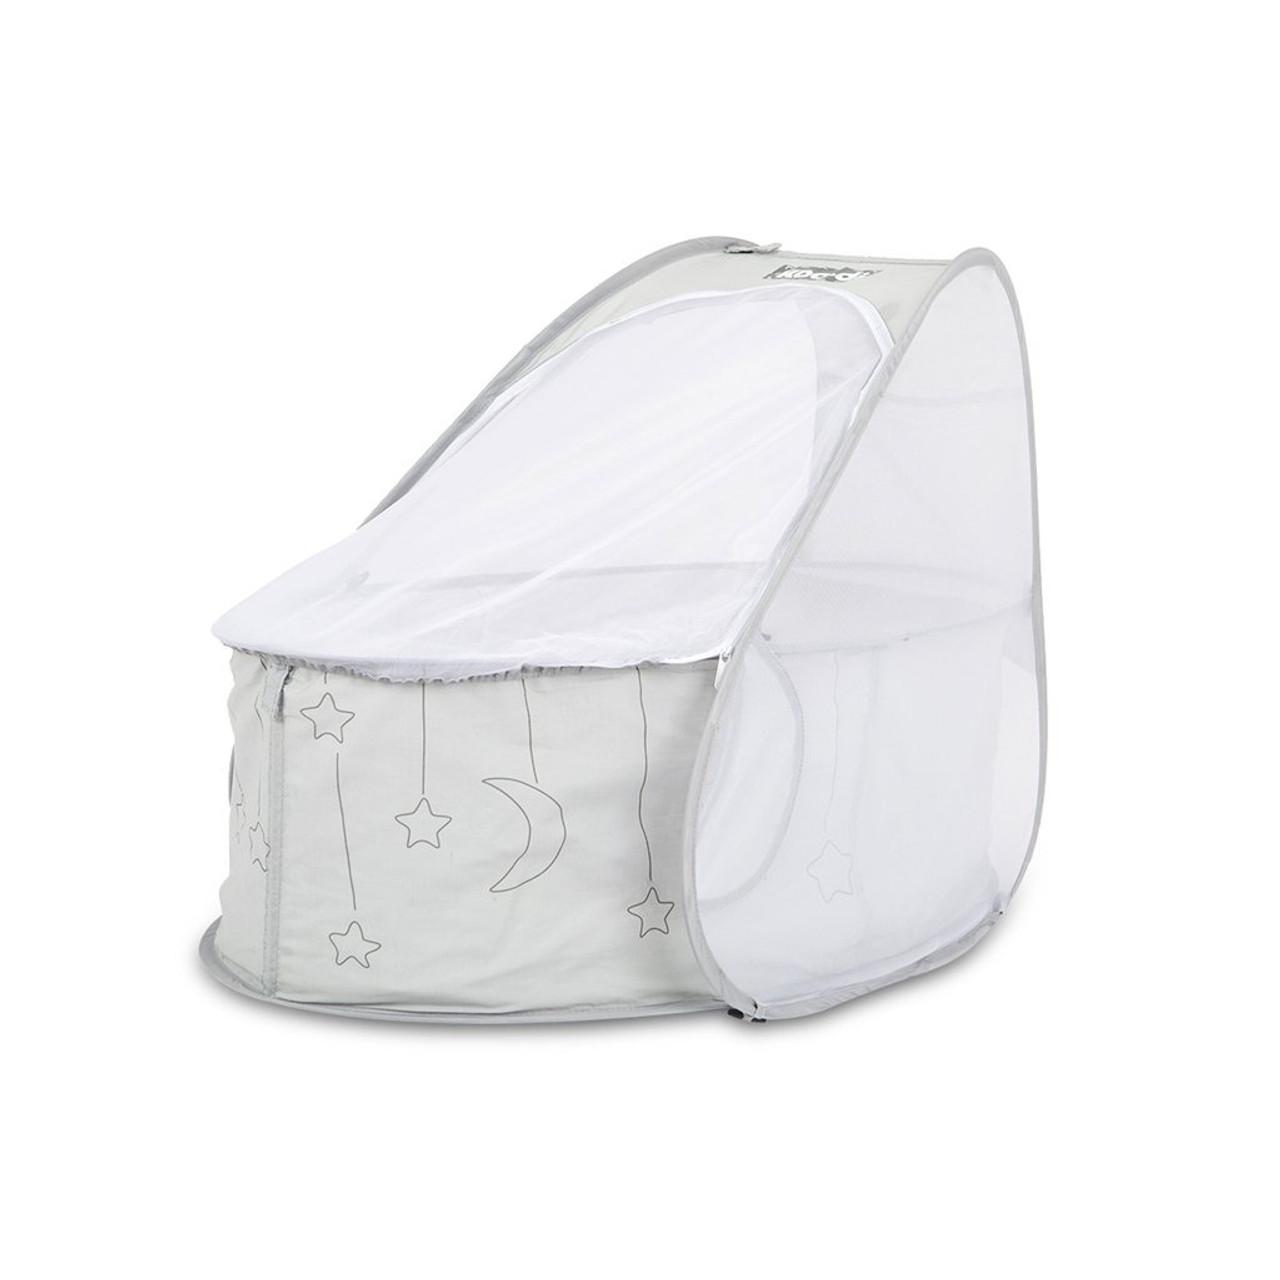 Koodi Newborn Pop Up Travel Bassinet Grey